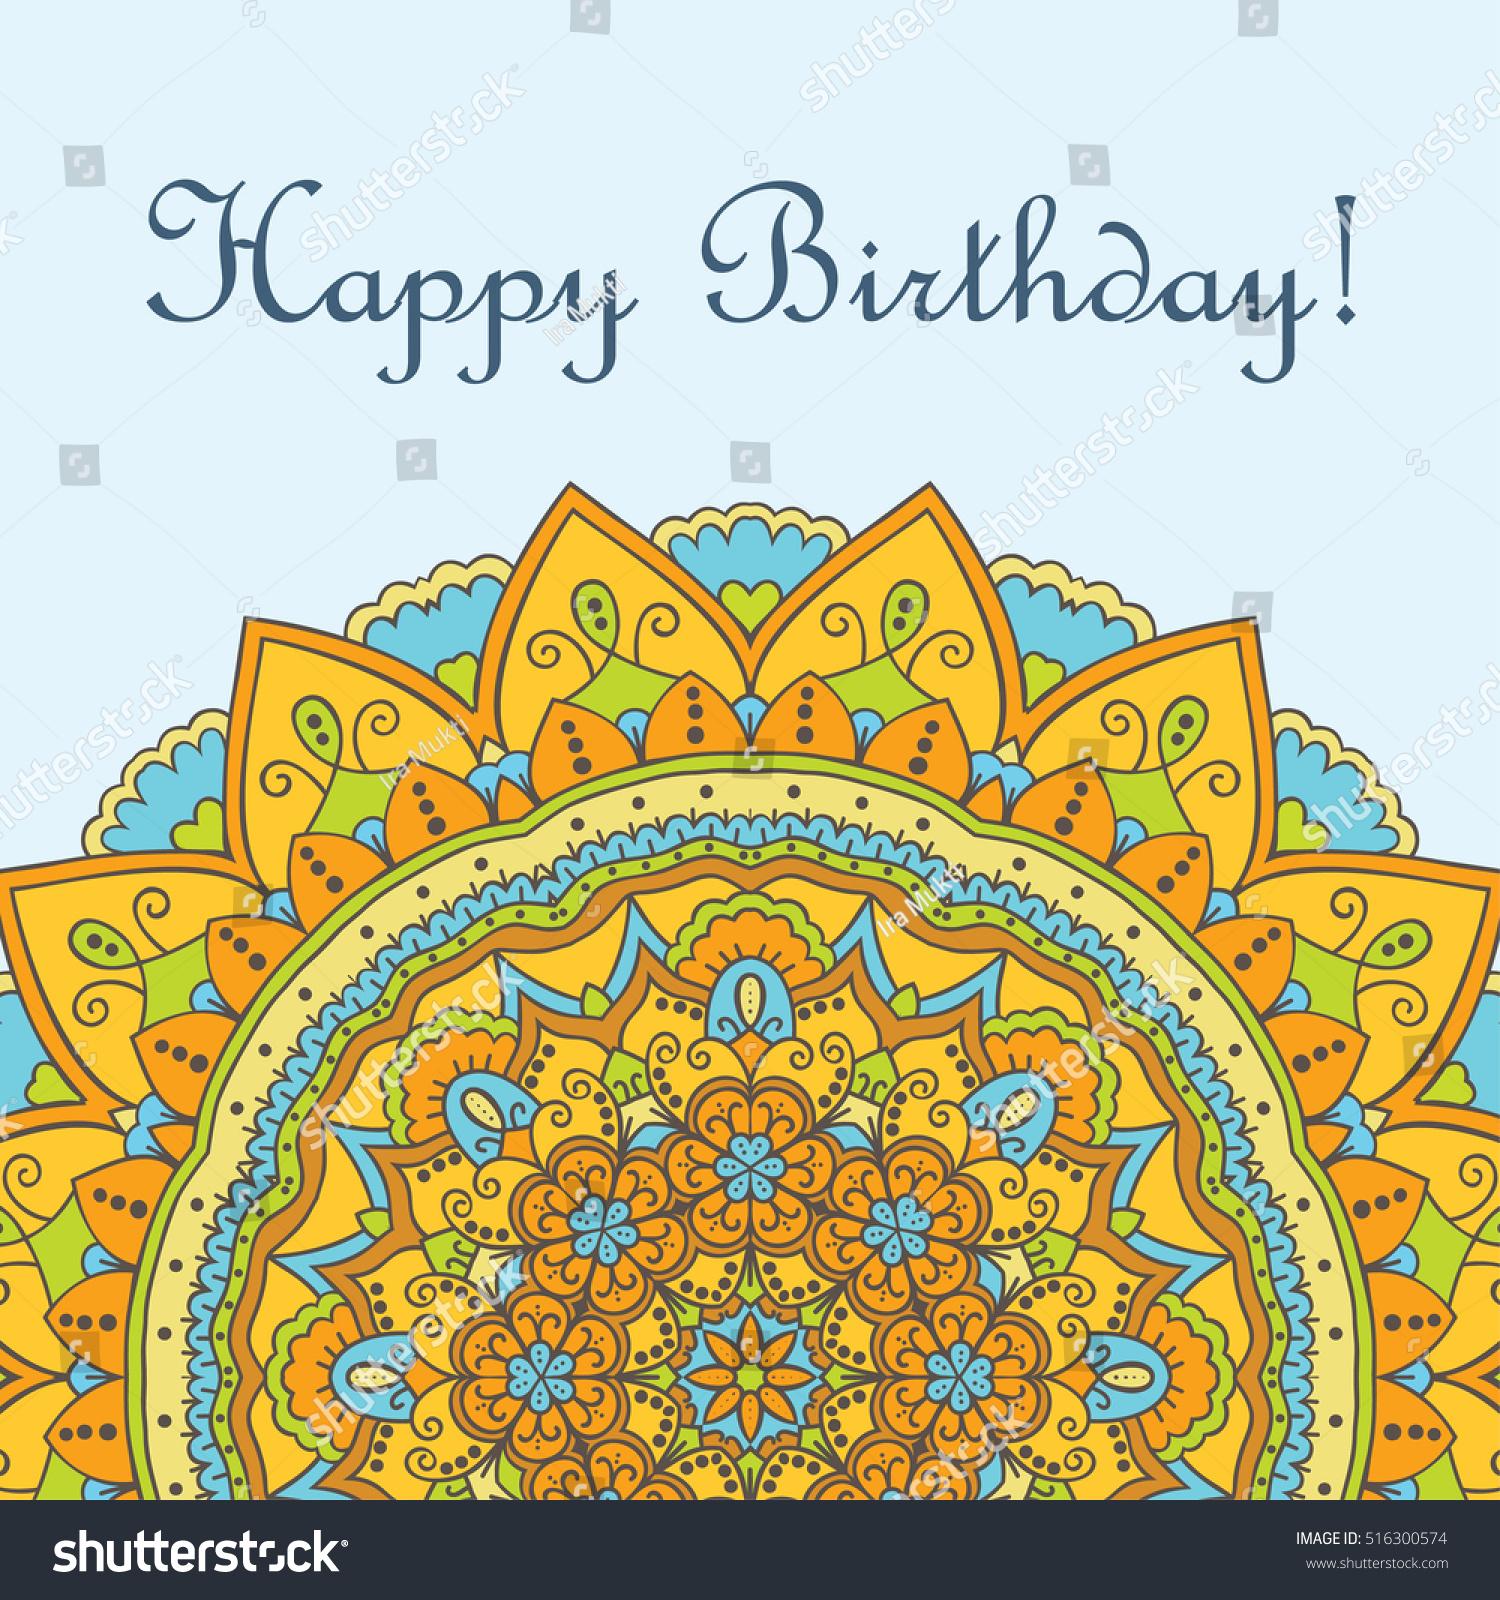 Mcdonalds Birthday Card Gallery Free Birthday Cards